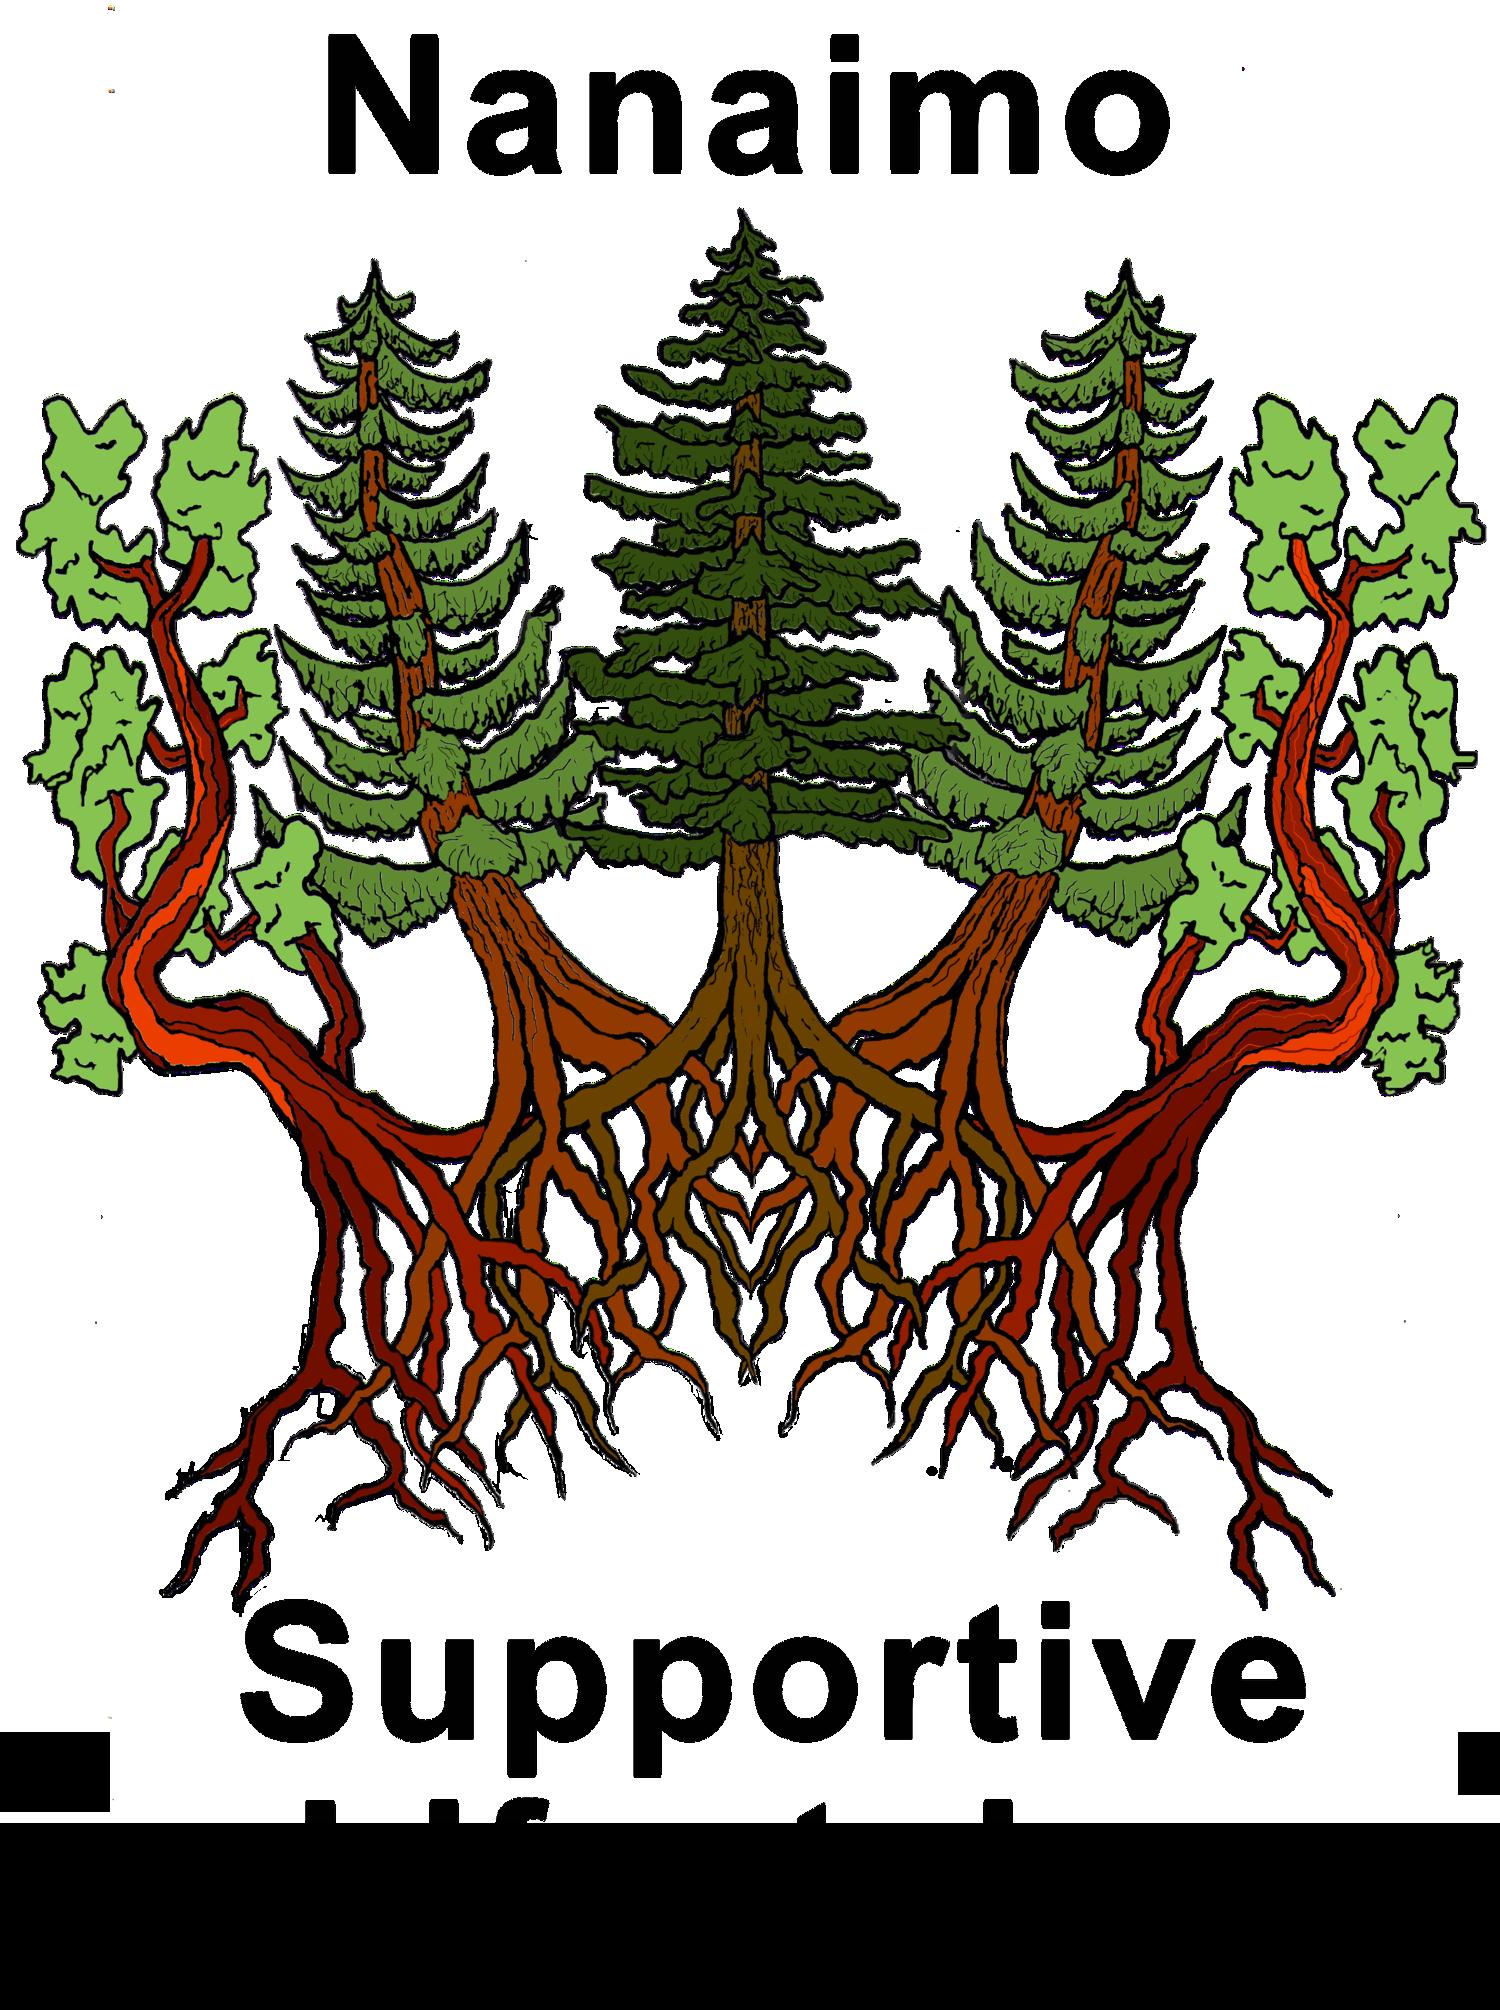 Nanaimo Supportive Lifestyles logo